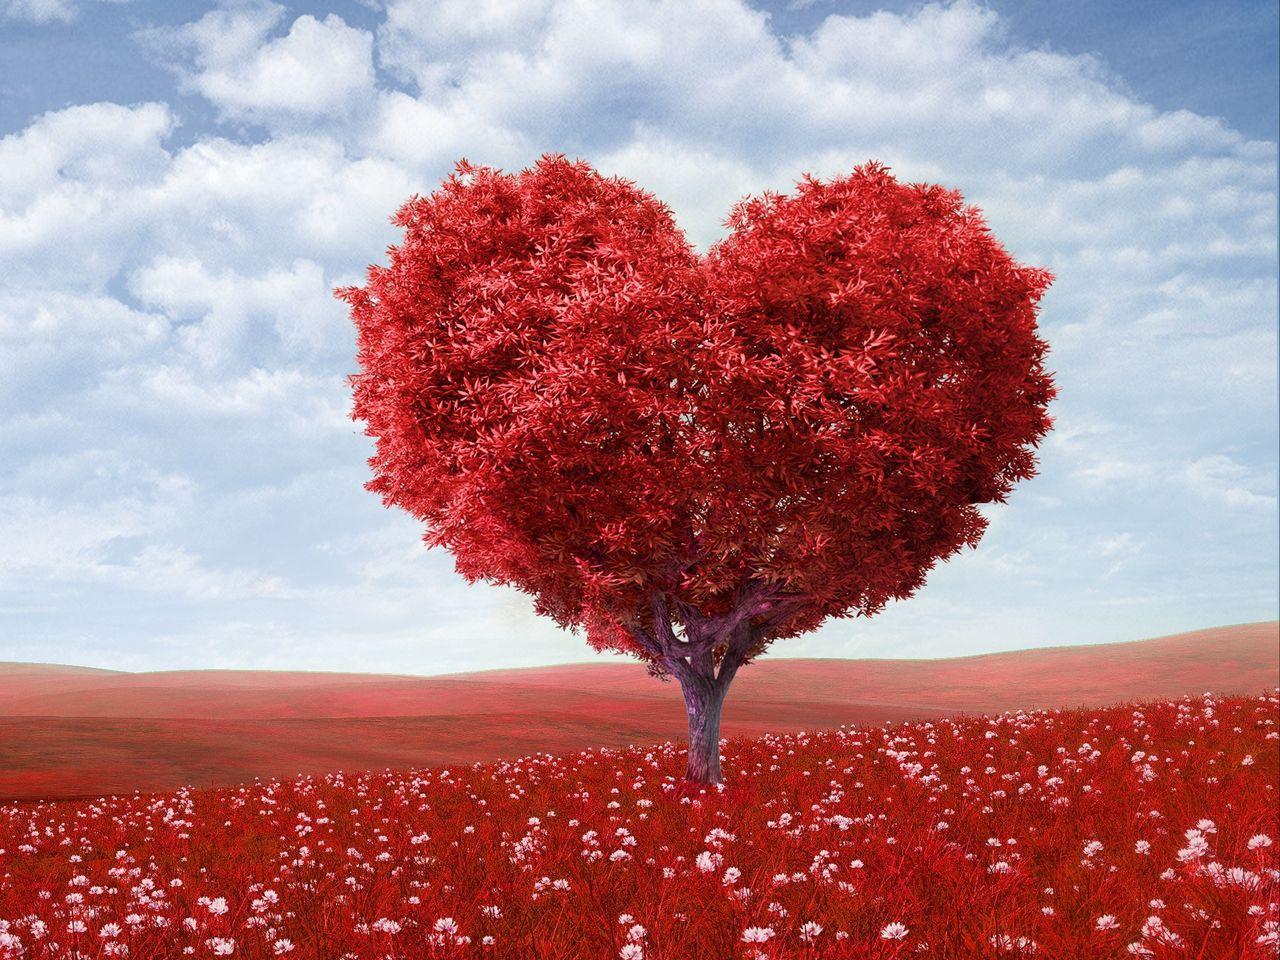 1280x960 Wallpaper tree, heart, photoshop, field, grass, romance